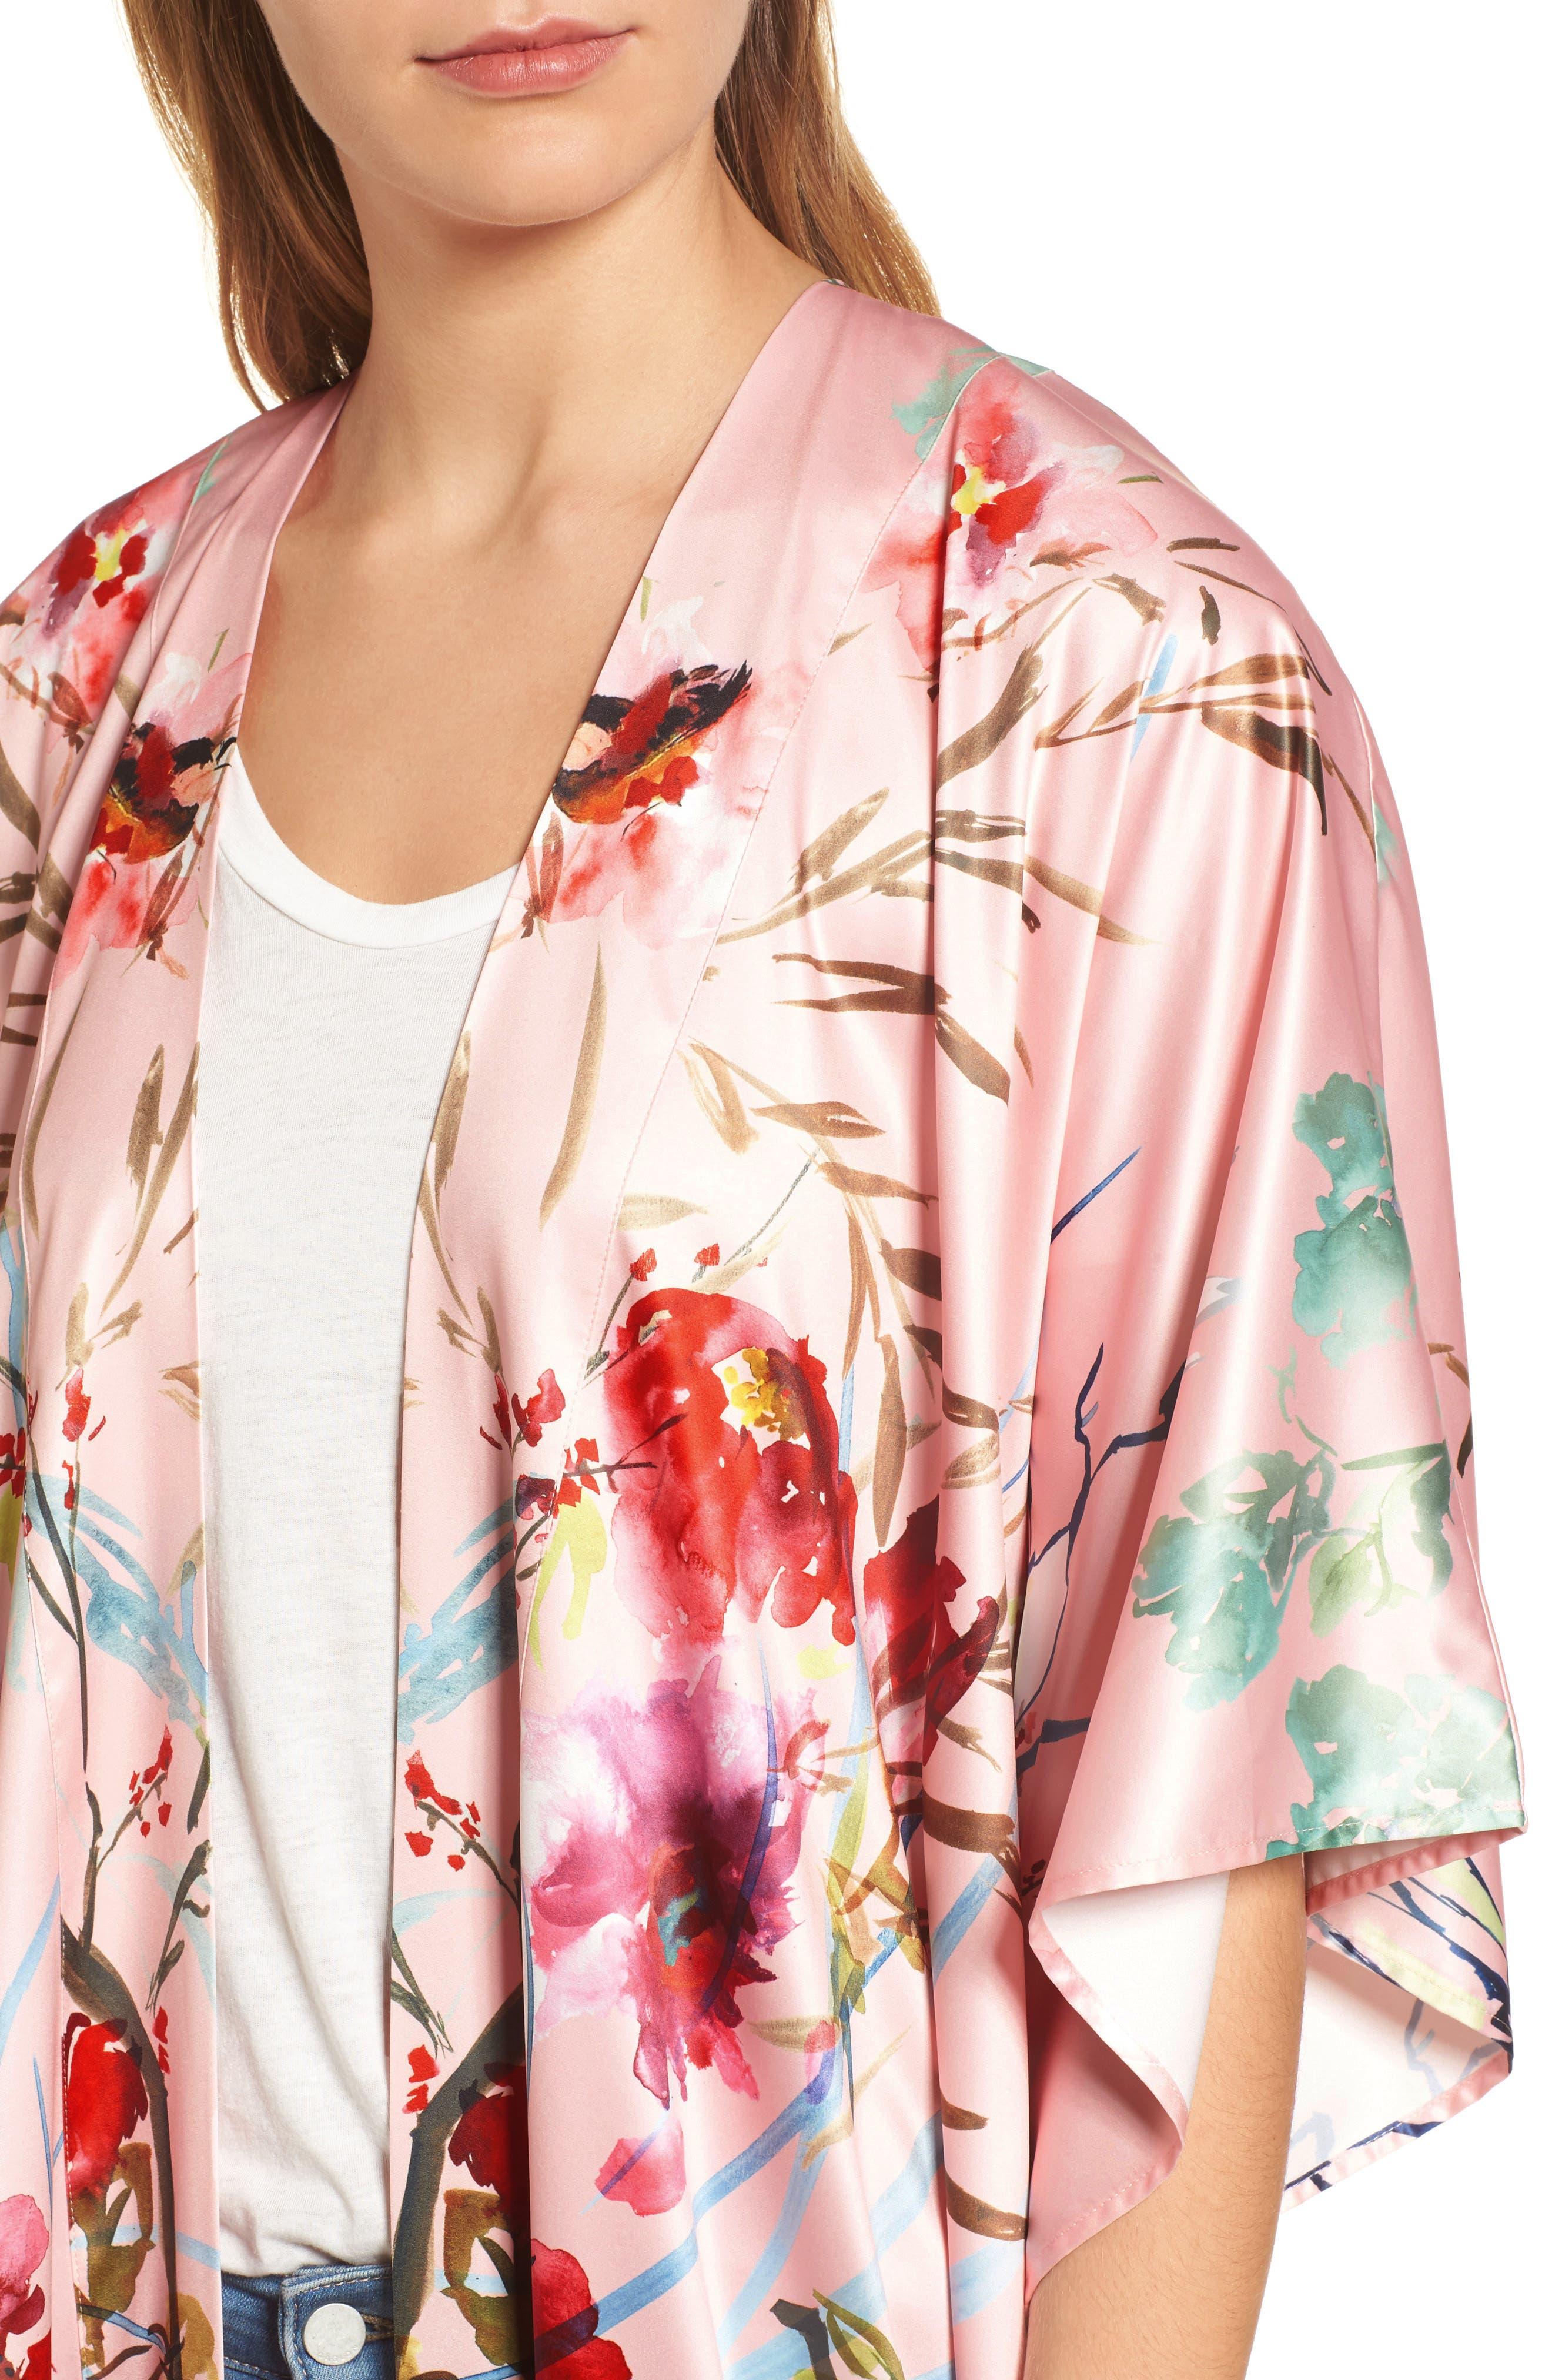 Floral Kimono,                             Alternate thumbnail 4, color,                             Pink Fantasy Garden Print